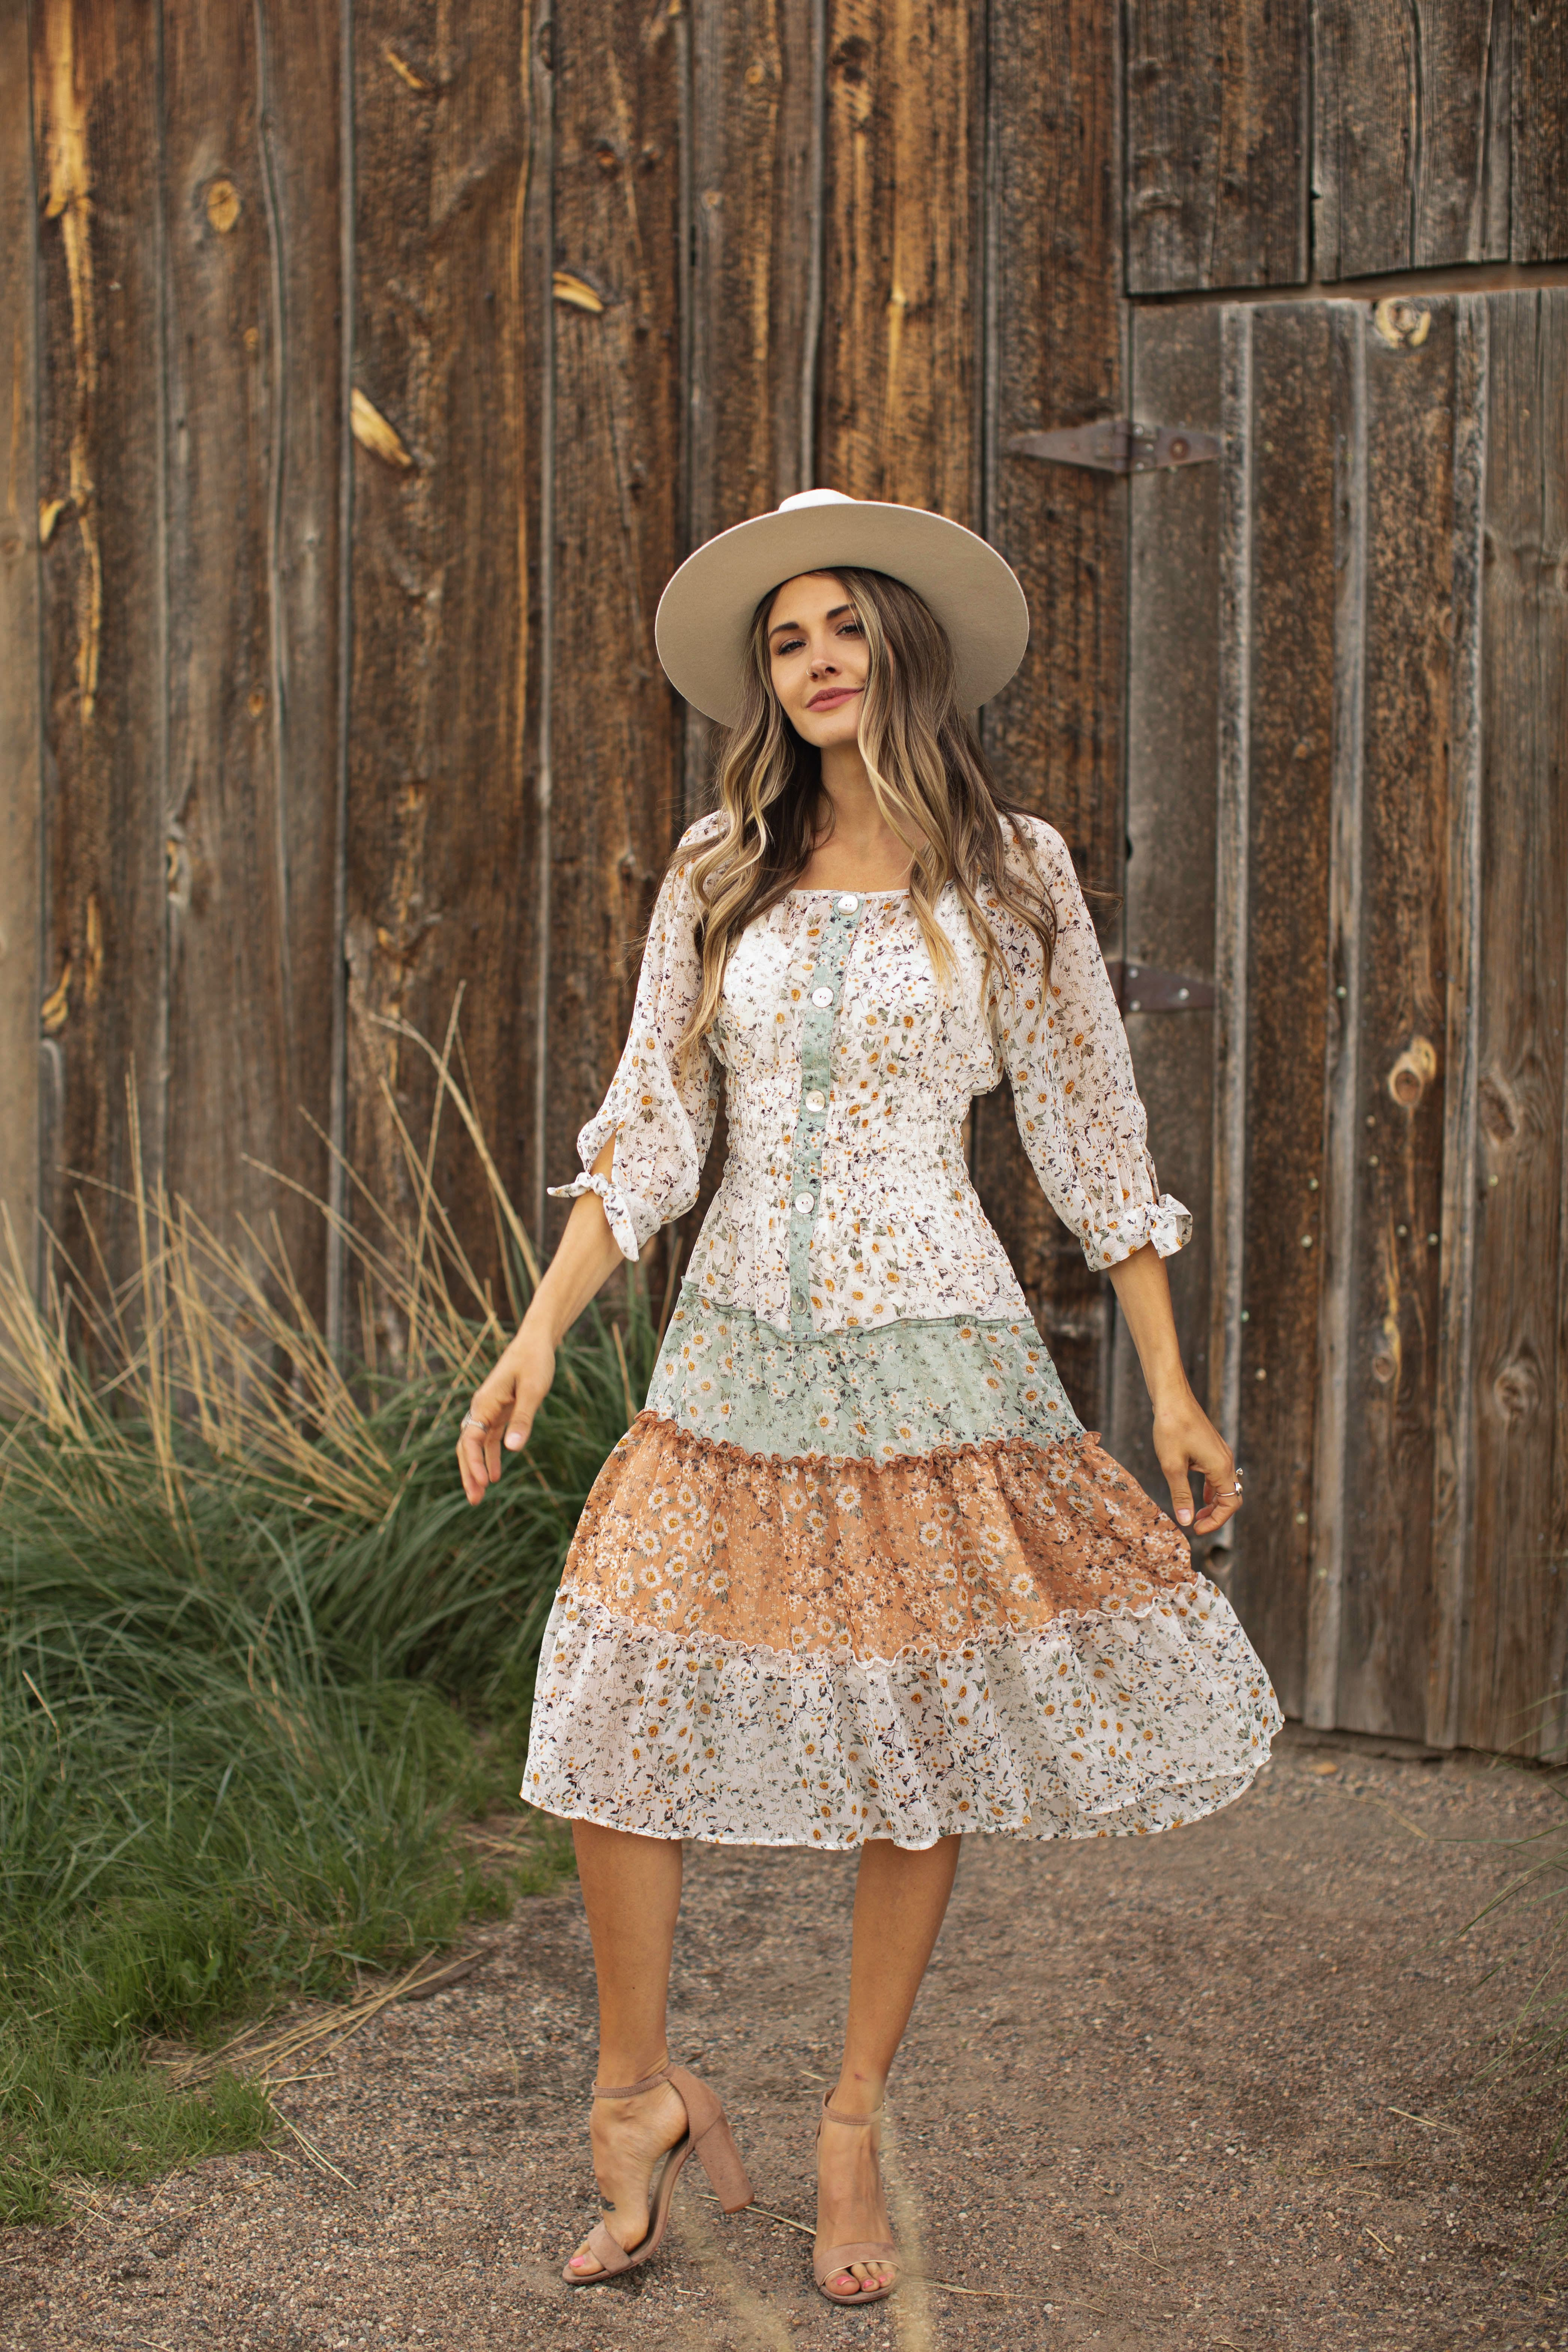 Alexa Mixed Ditsy Peasant Dress - Olive/Brown - Front